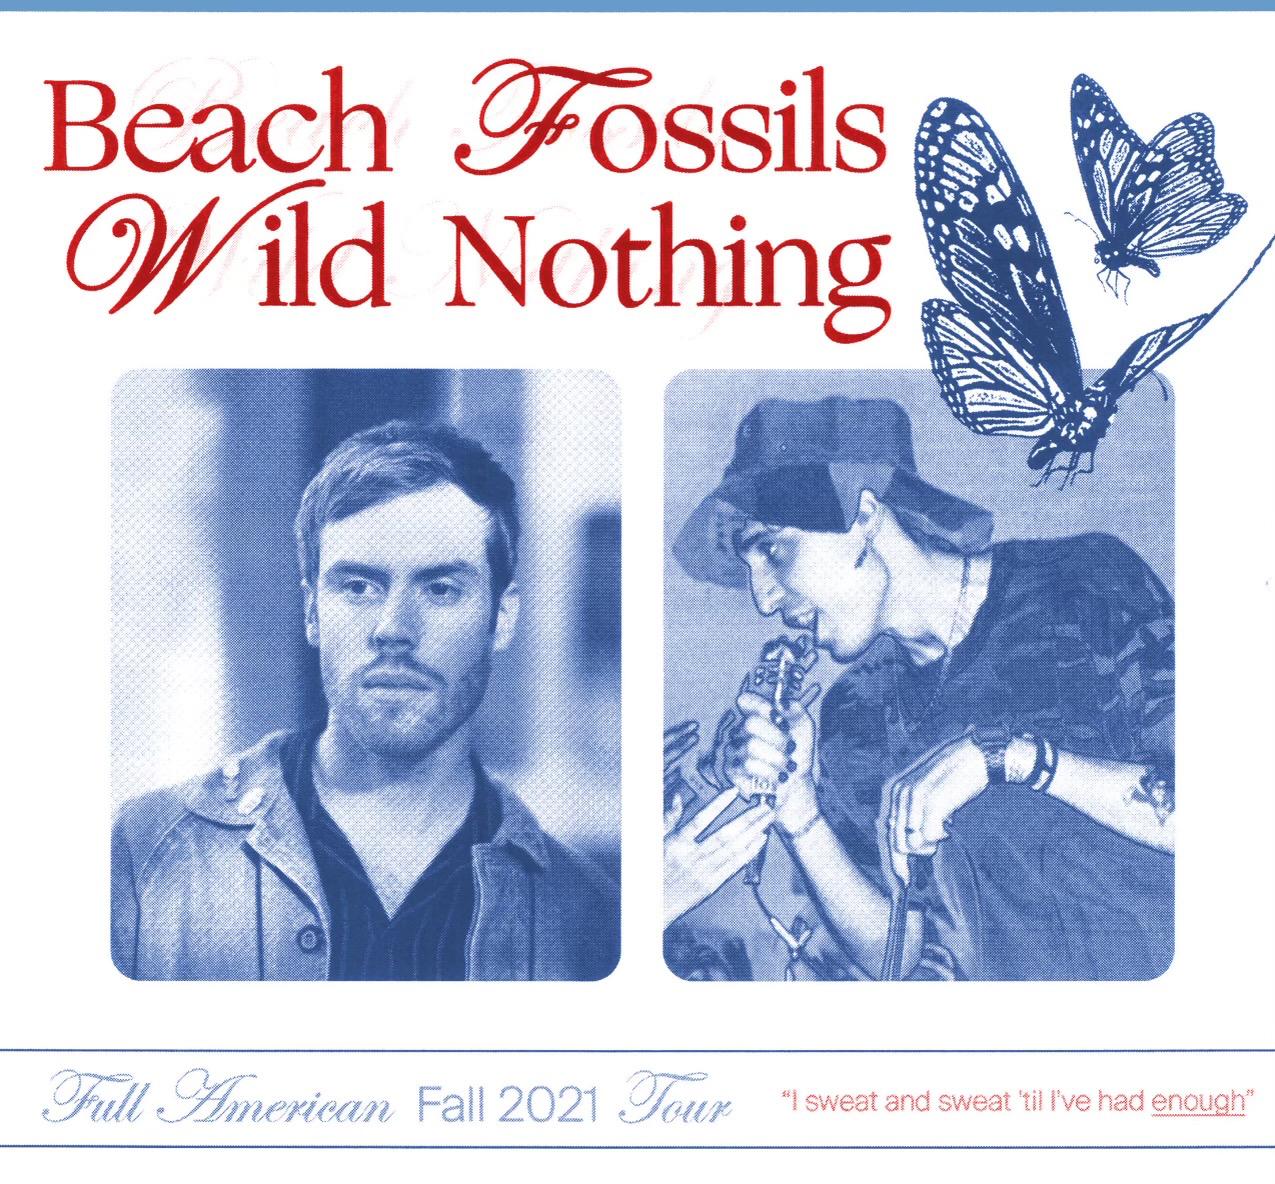 Beach Fossils & Wild Nothing: